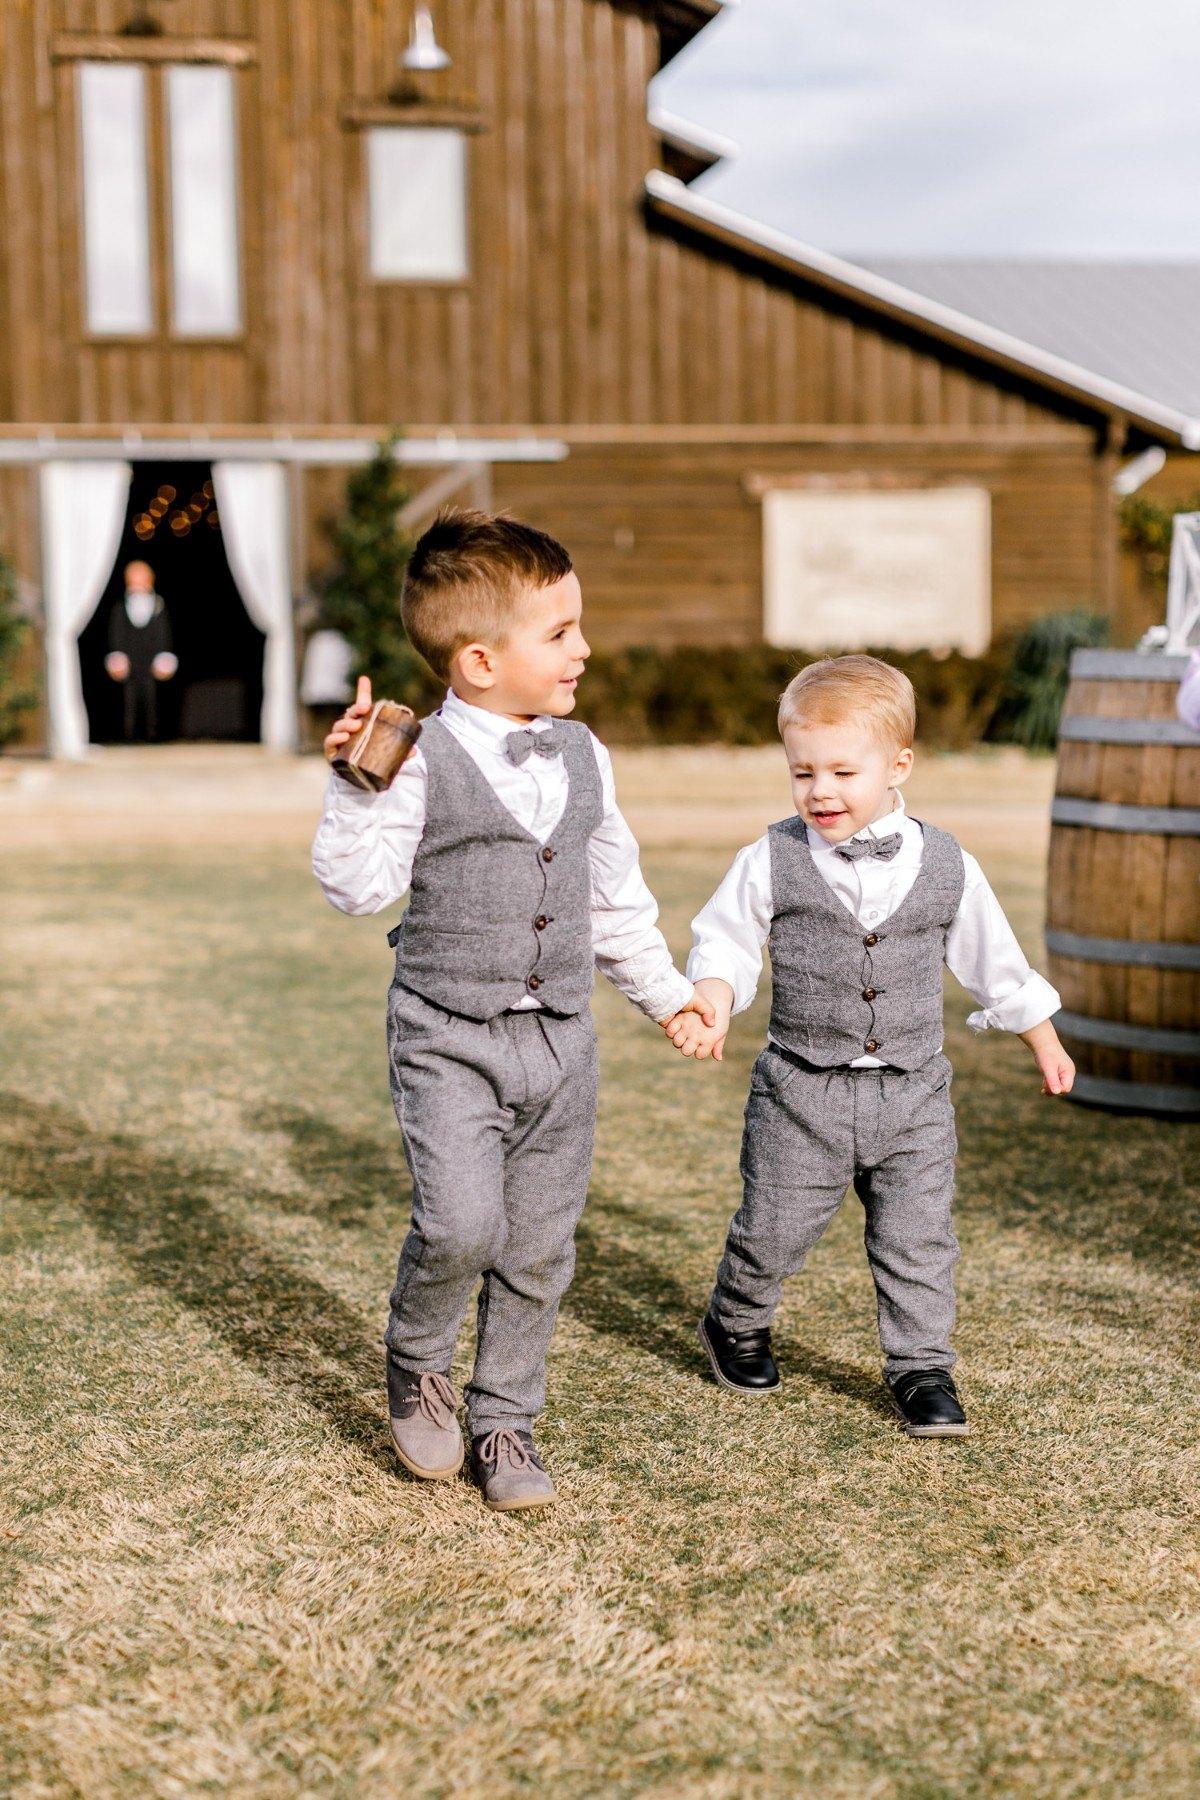 ennis-texas-wedding-photographer-kaitlyn-bullard-63.jpg